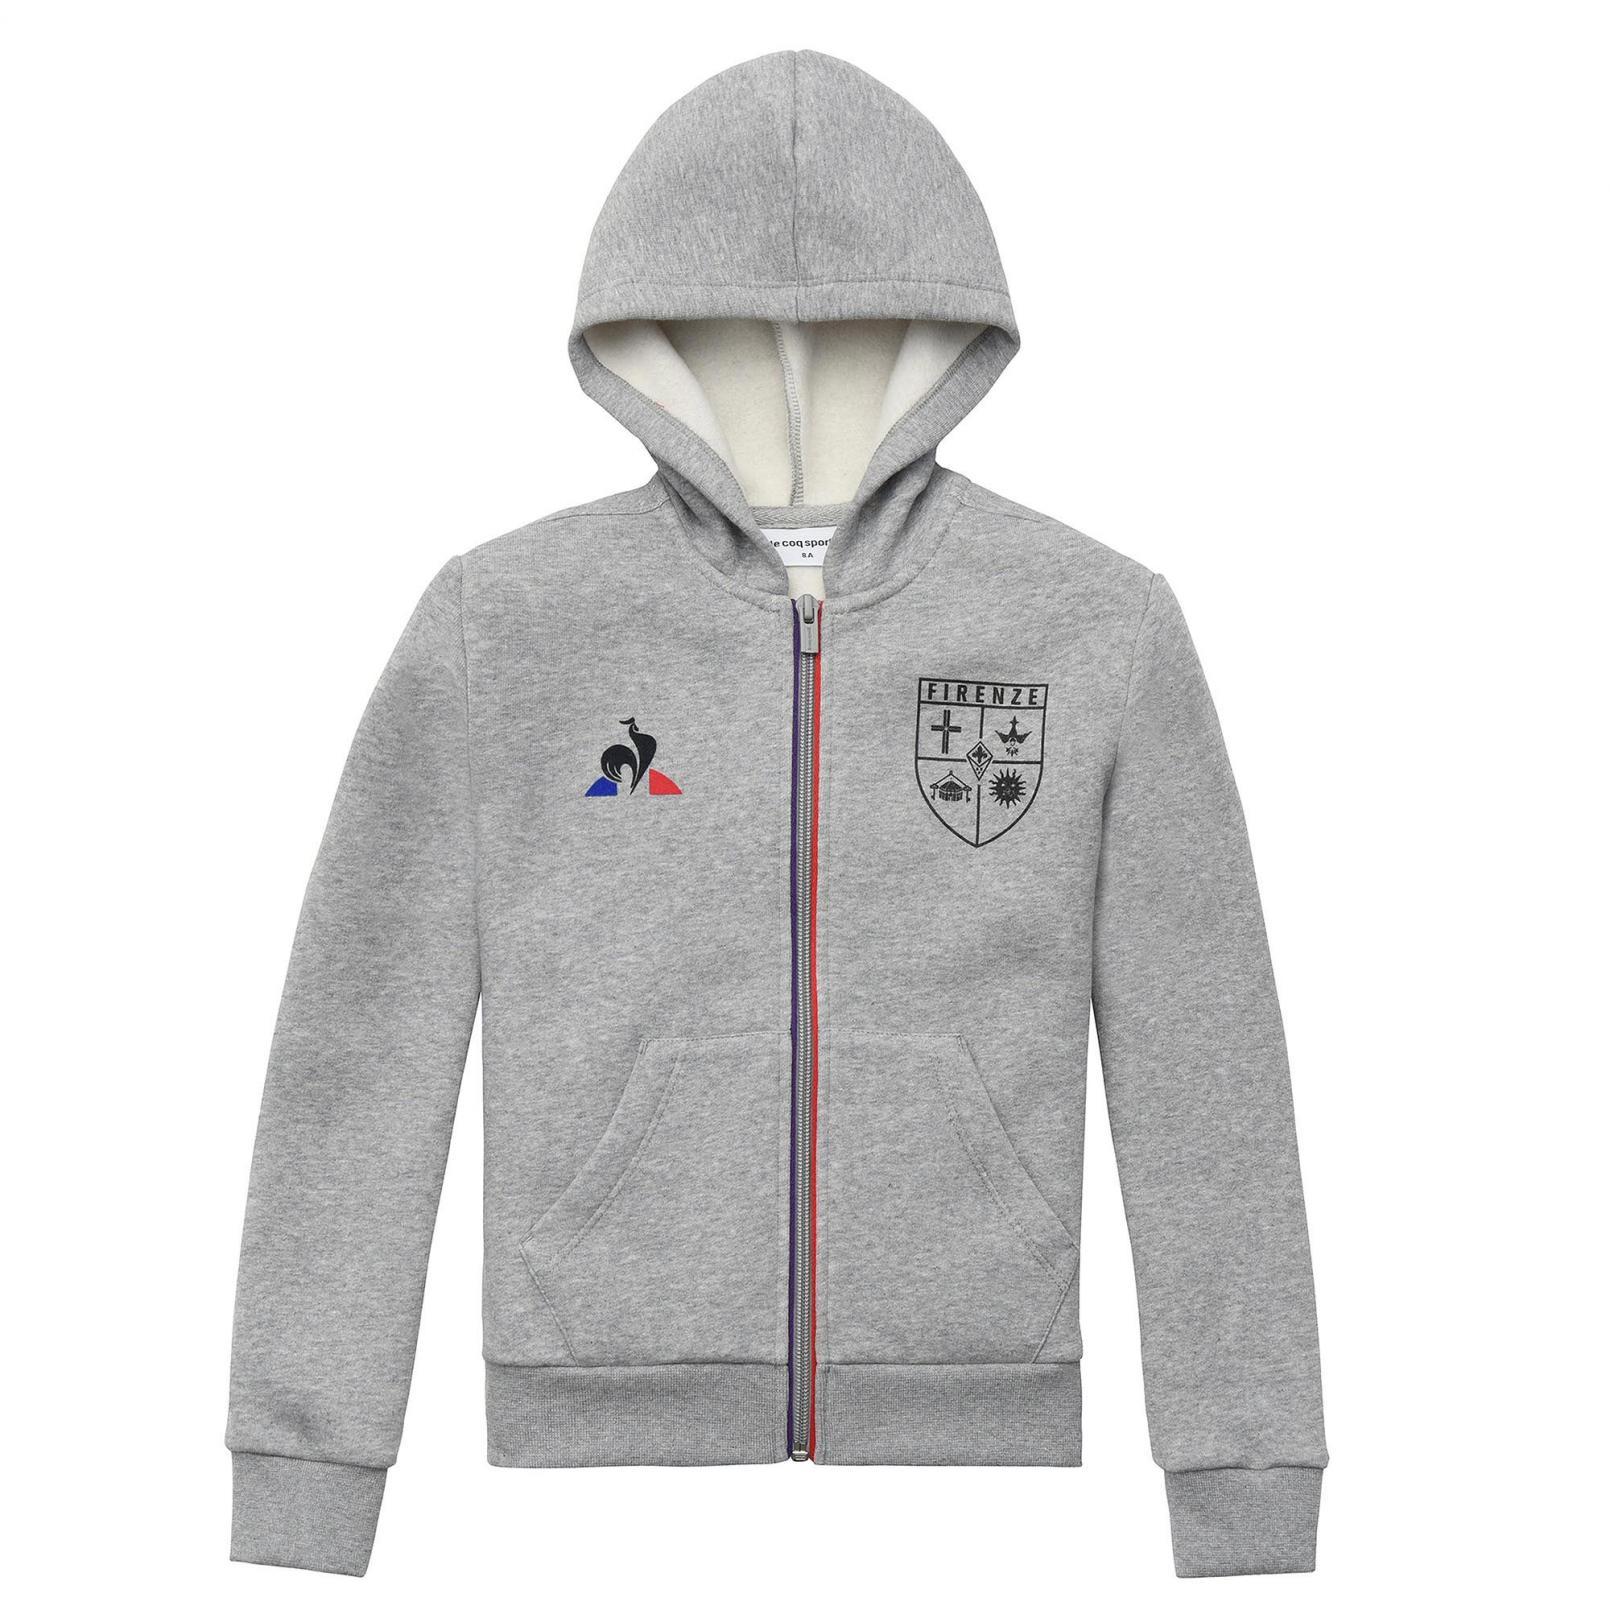 Kids Apparel – Le Coq Sportif Fiorentina Fanwear Full zip hood Grey